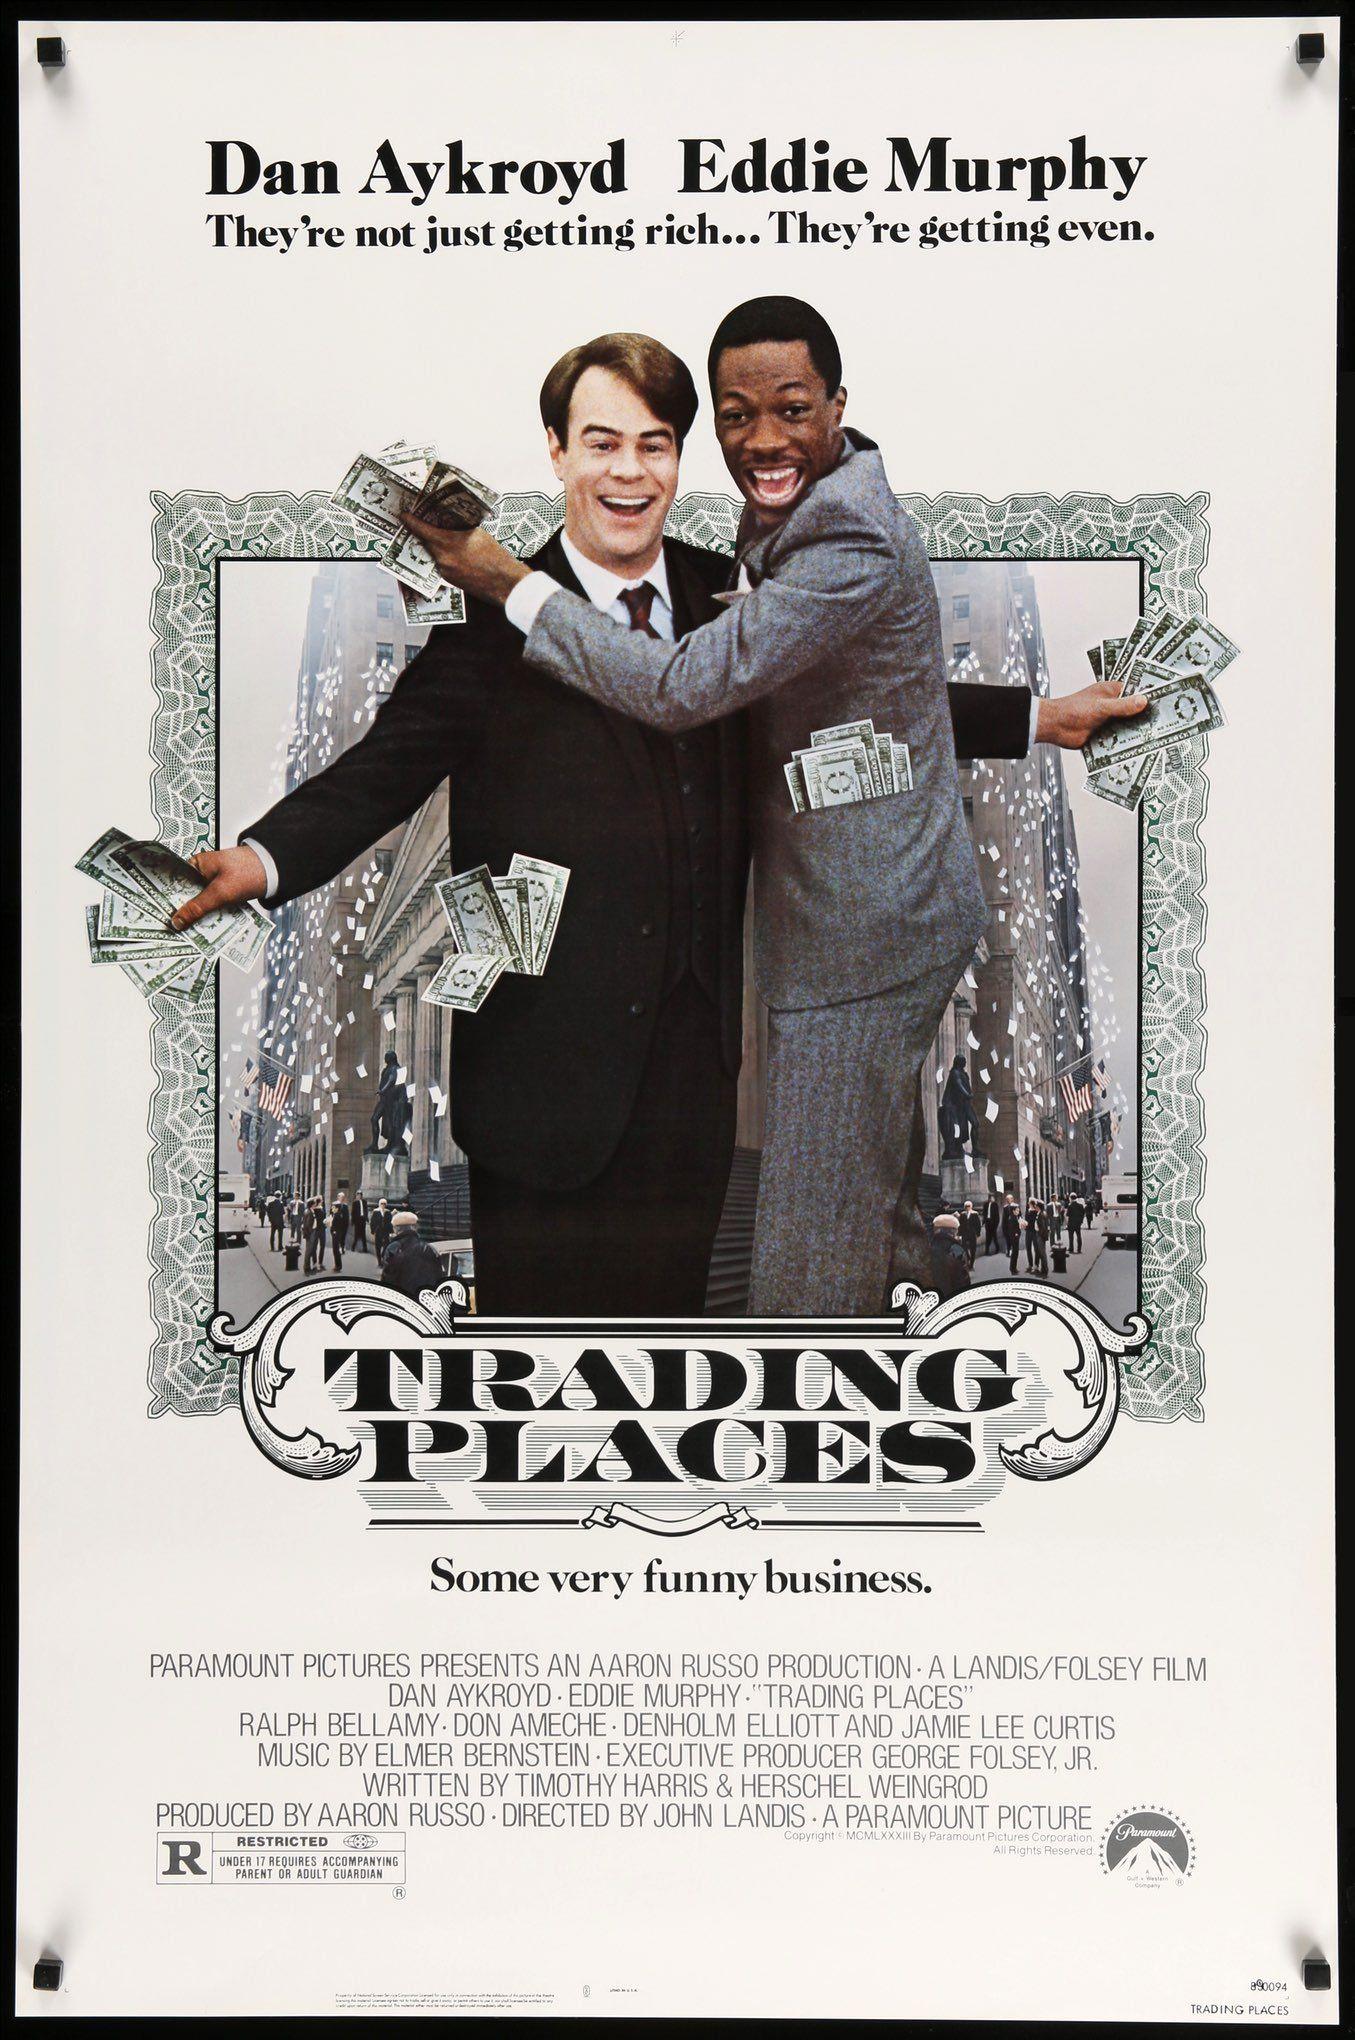 Pin By David On Movies Trading Places Eddie Murphy Eddie Murphy Movies